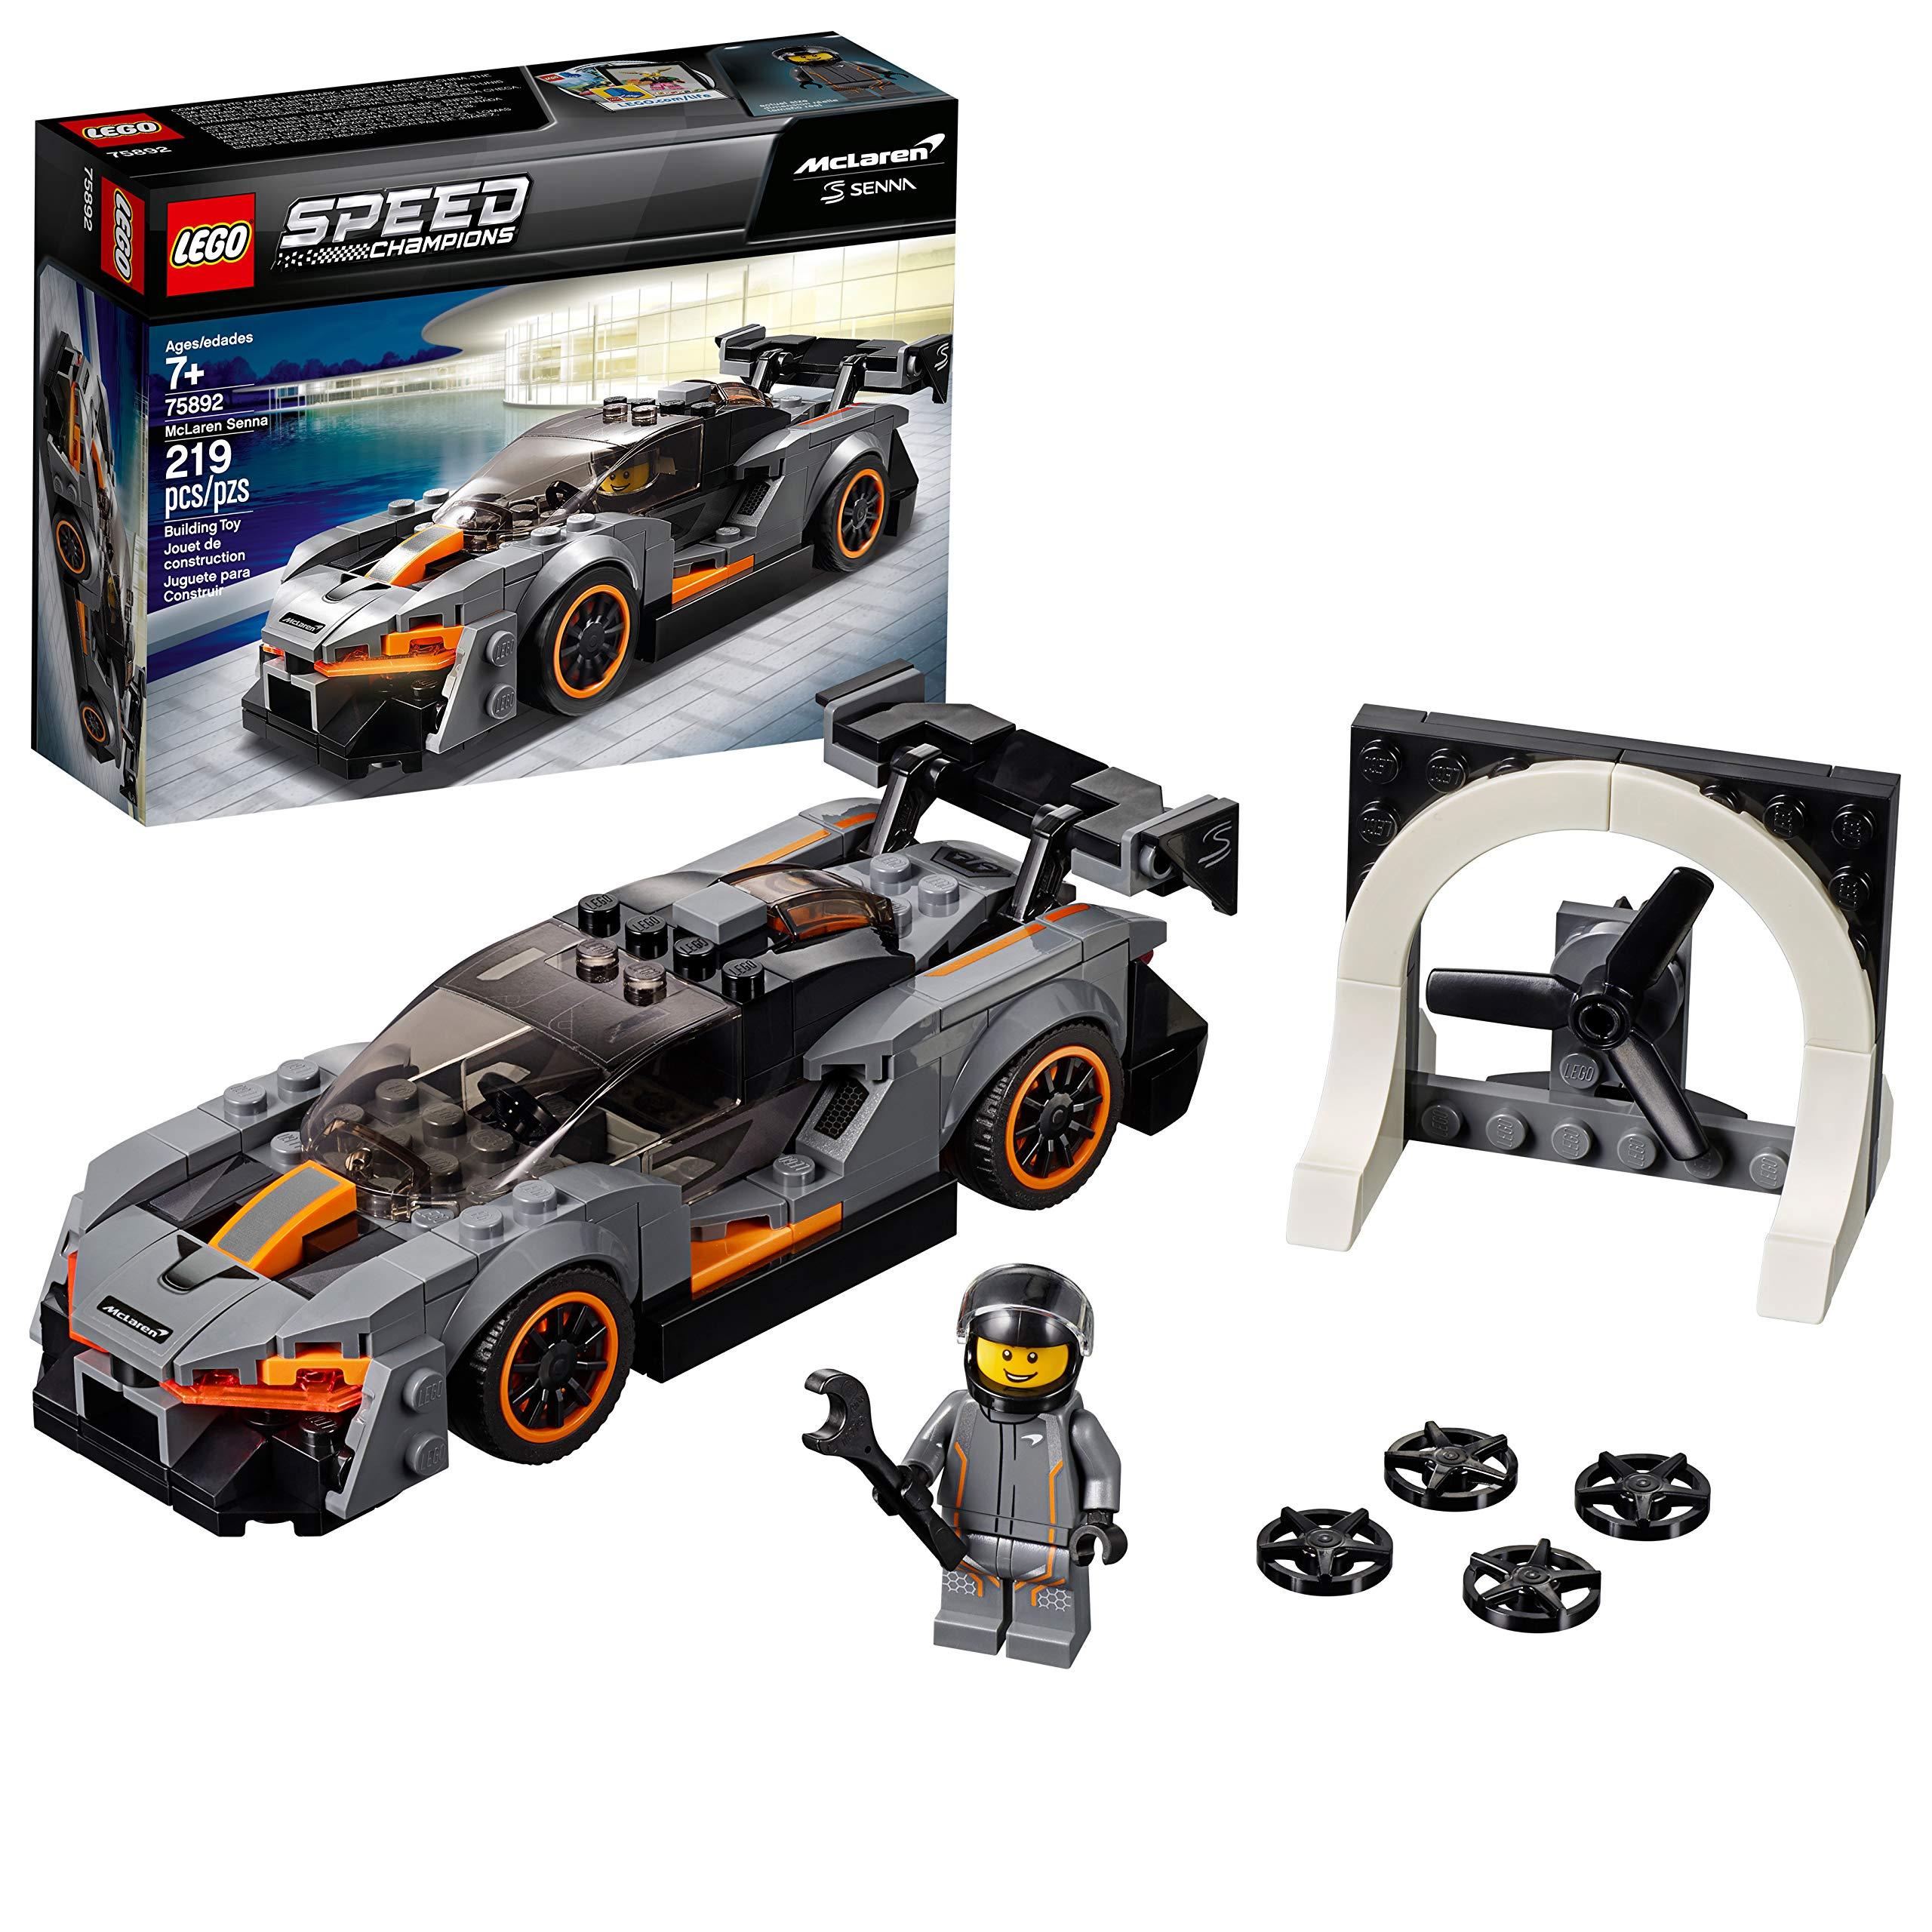 LEGO Speed Champions McLaren Building